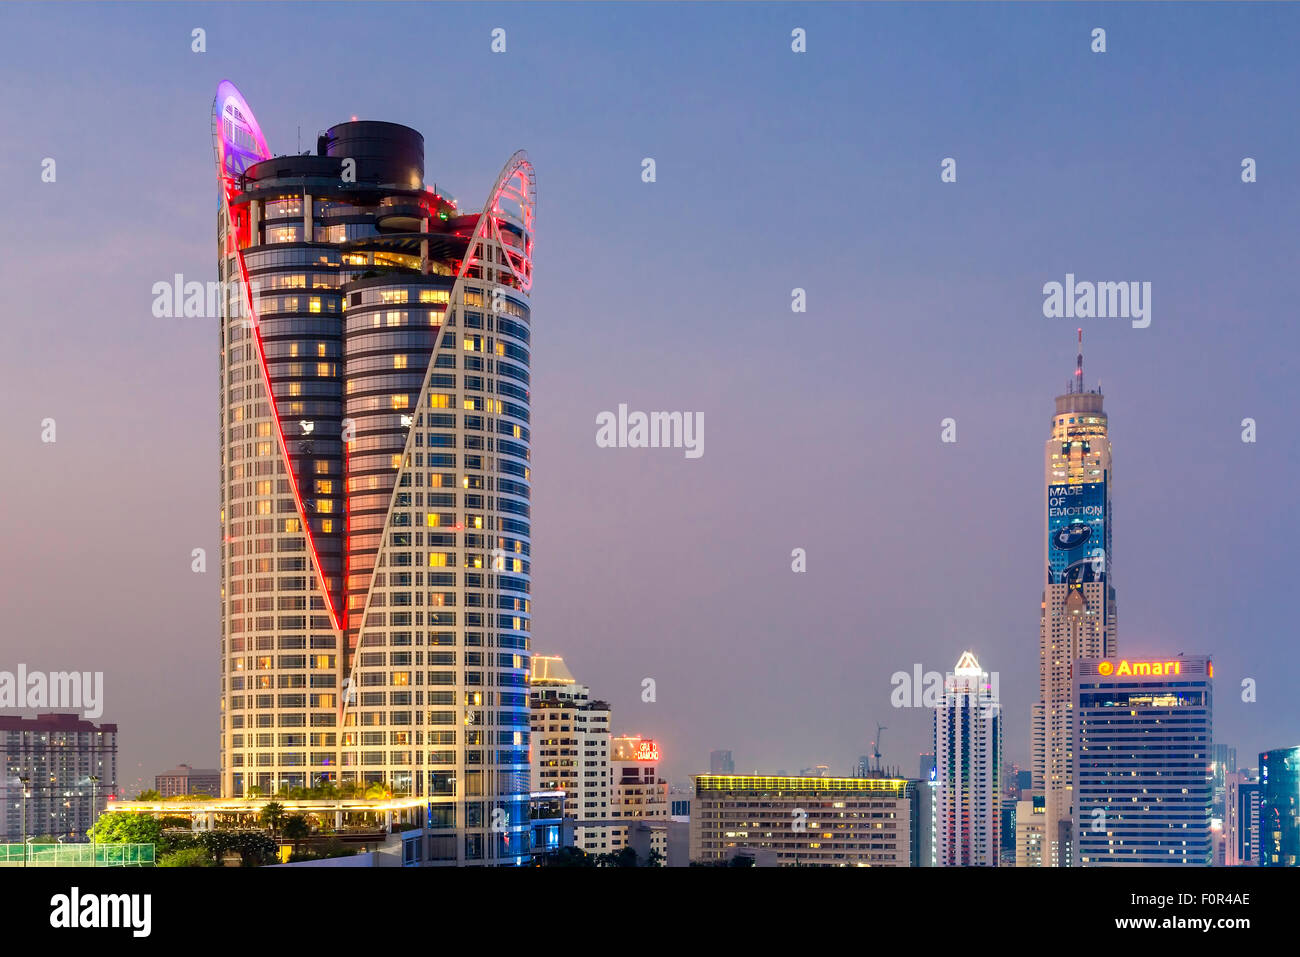 Bangkok Skyline with Centara Grand Tower and Baiyoke sky Hotel - Stock Image